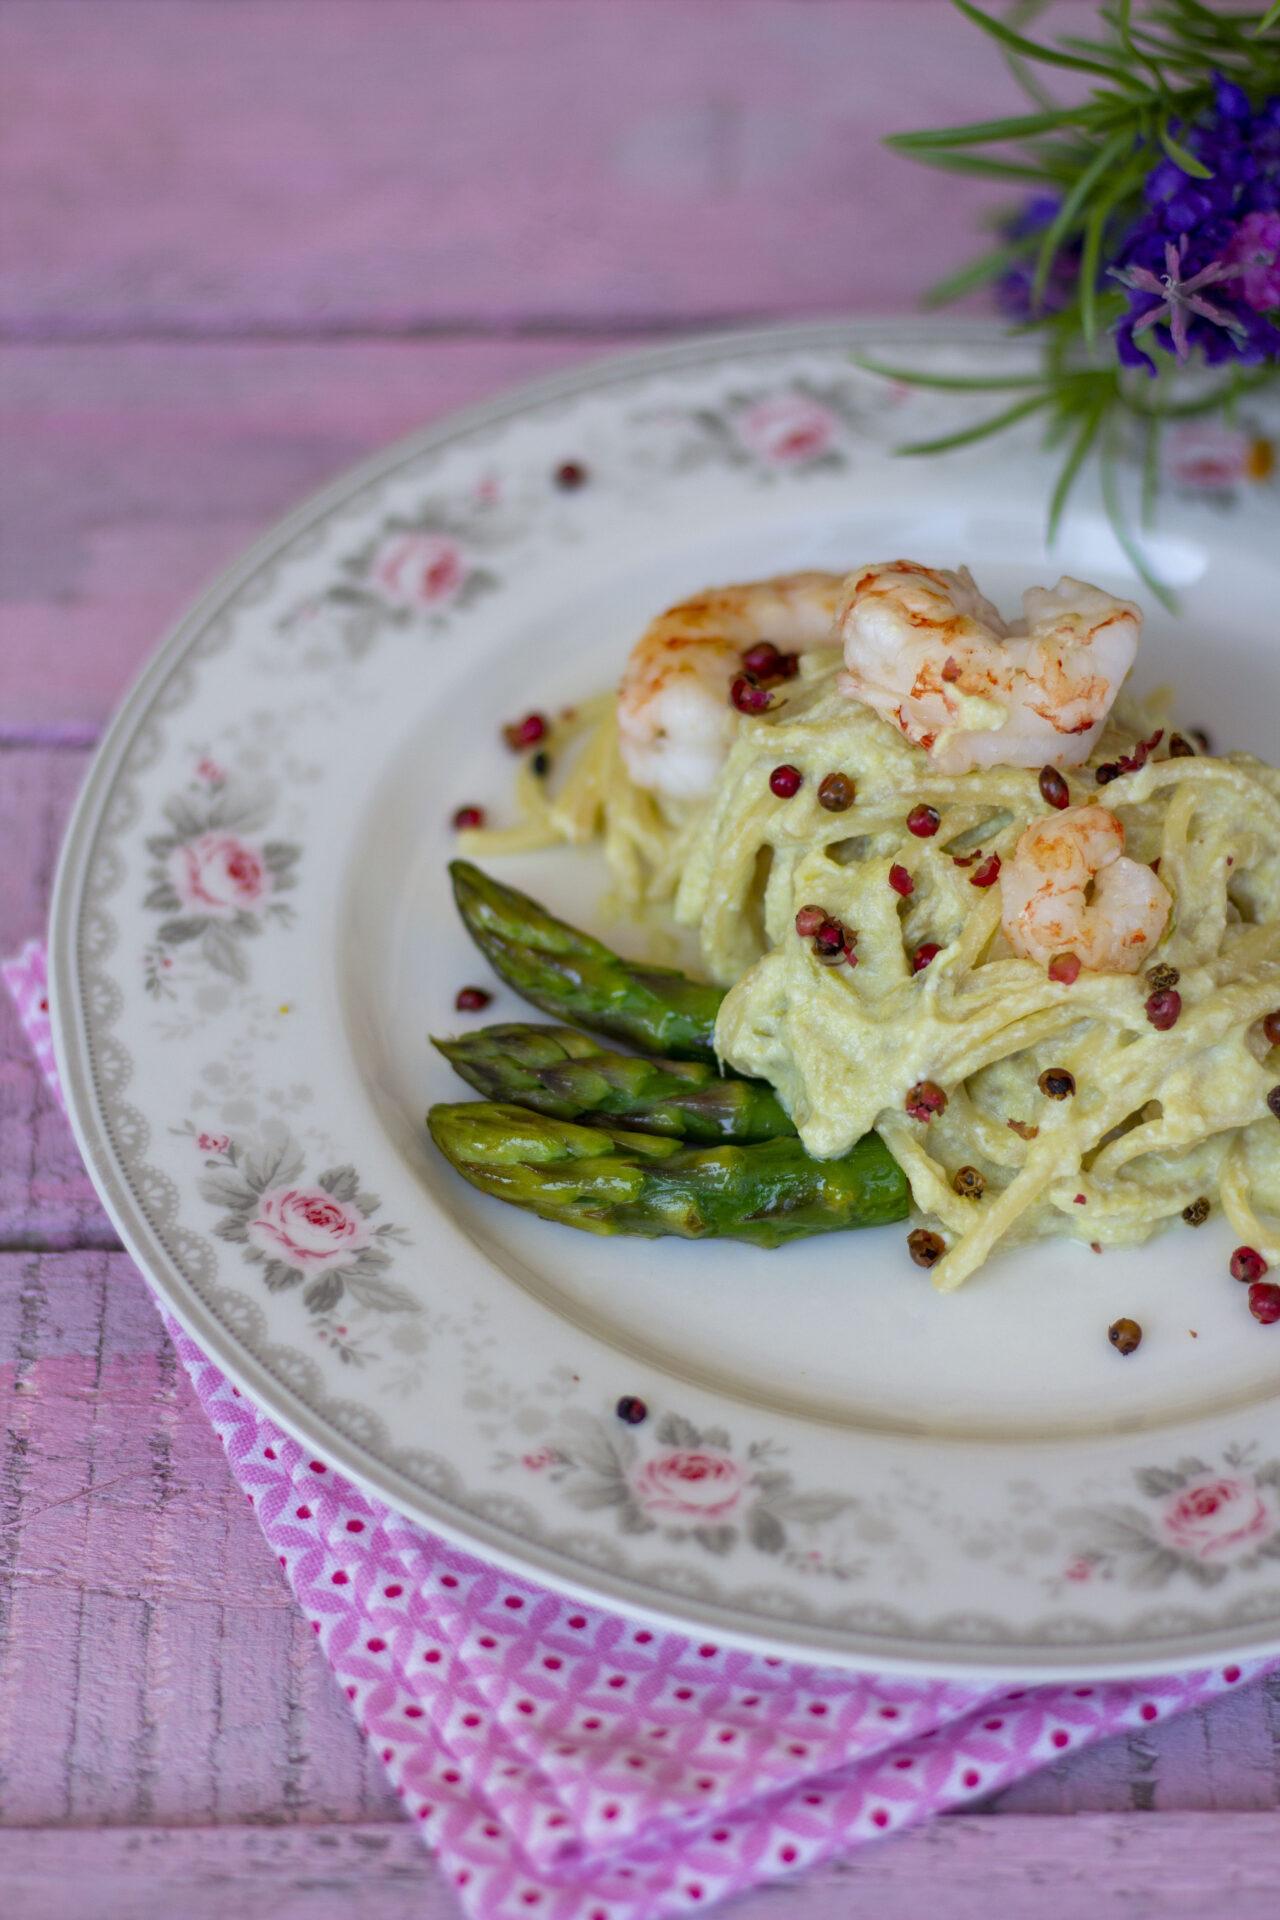 Ricetta spaghetti pasta armando crema asparagi gamberi pepe rosa kucina di kiara 1